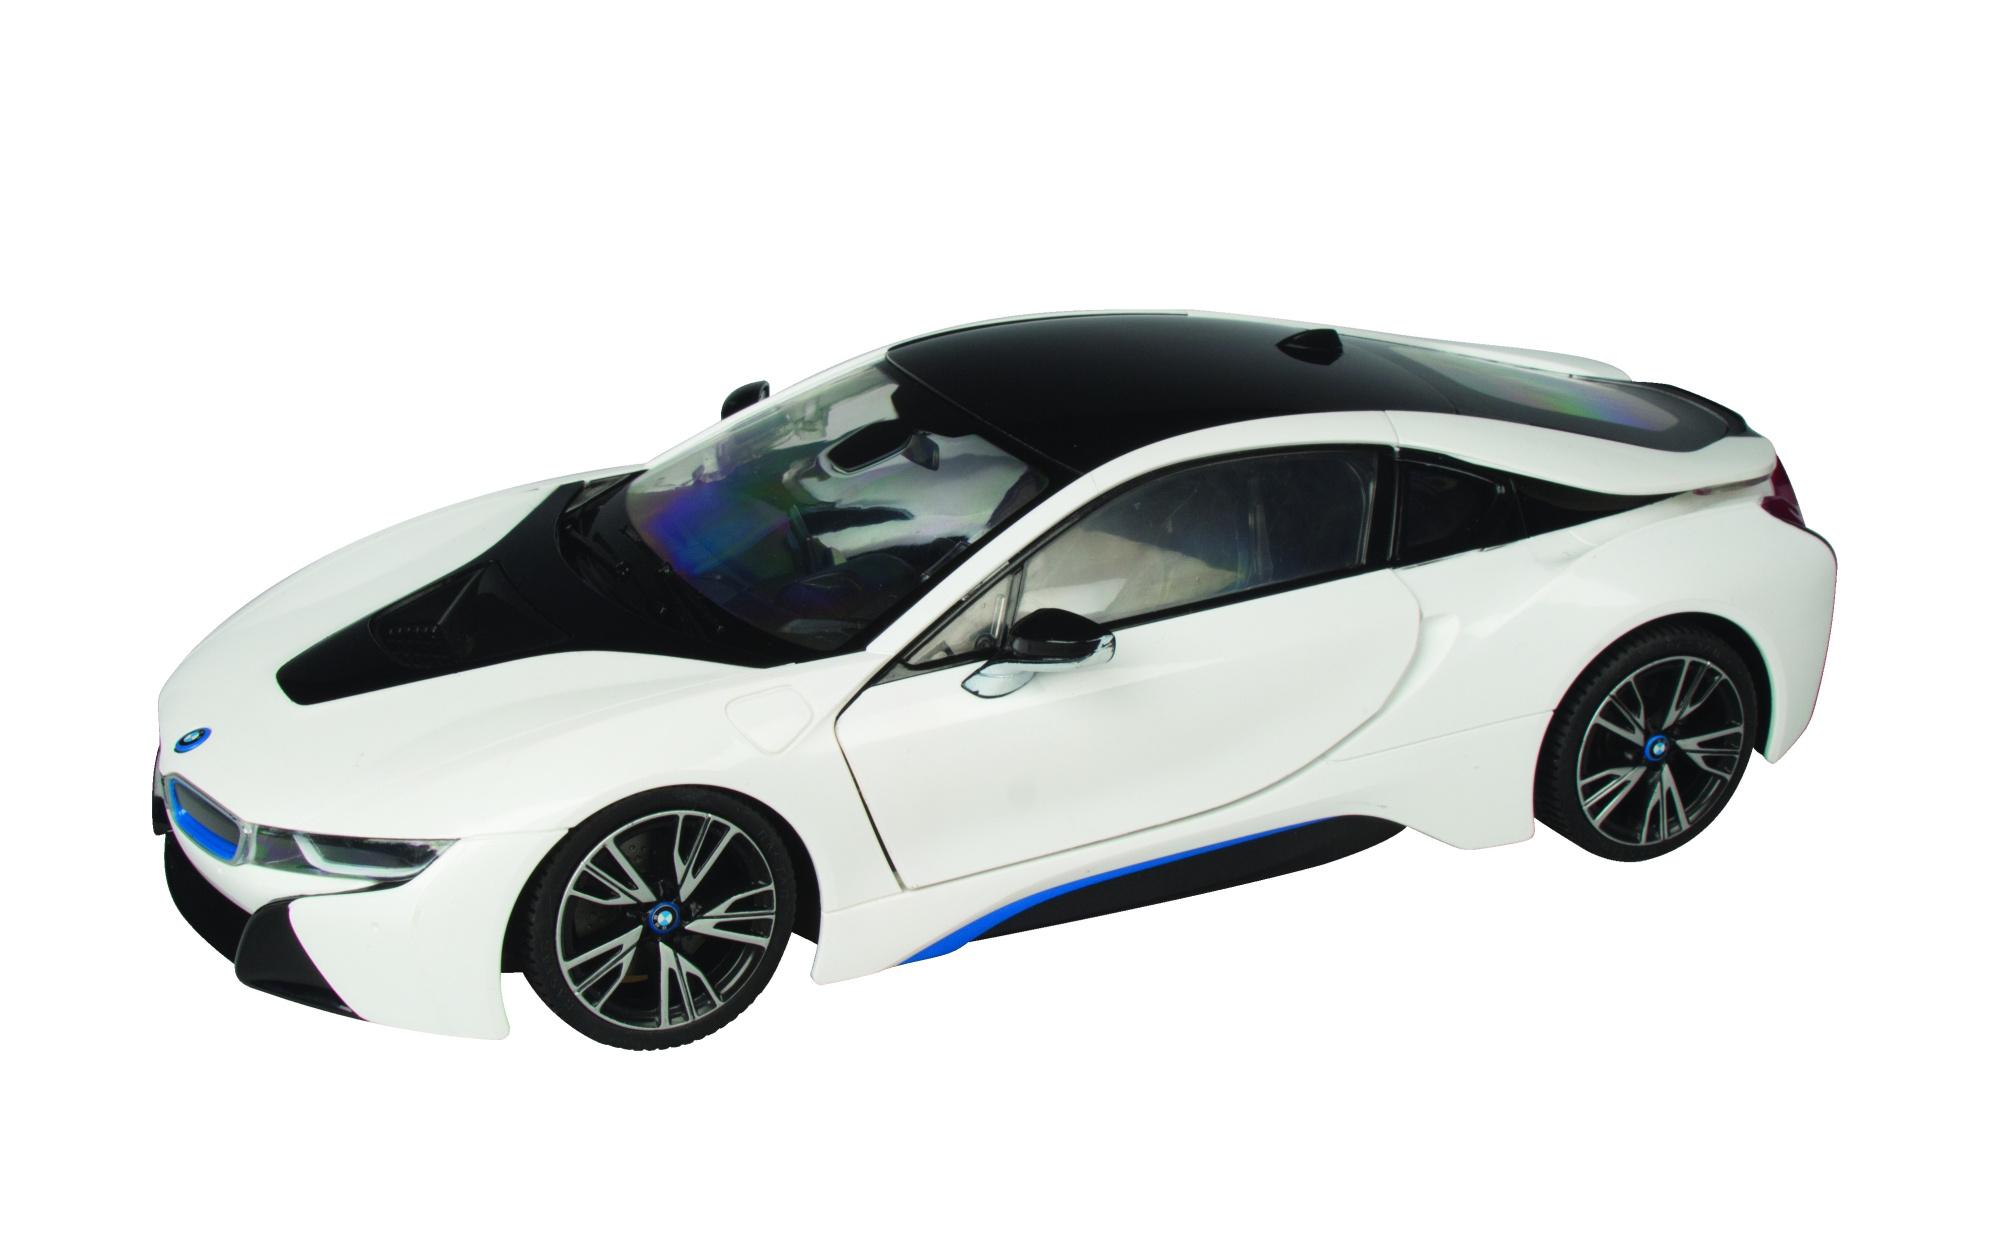 Avigo Bmw I8 >> BMW i8 1:14 Remote Control Car Toy with Opening Doors | eBay